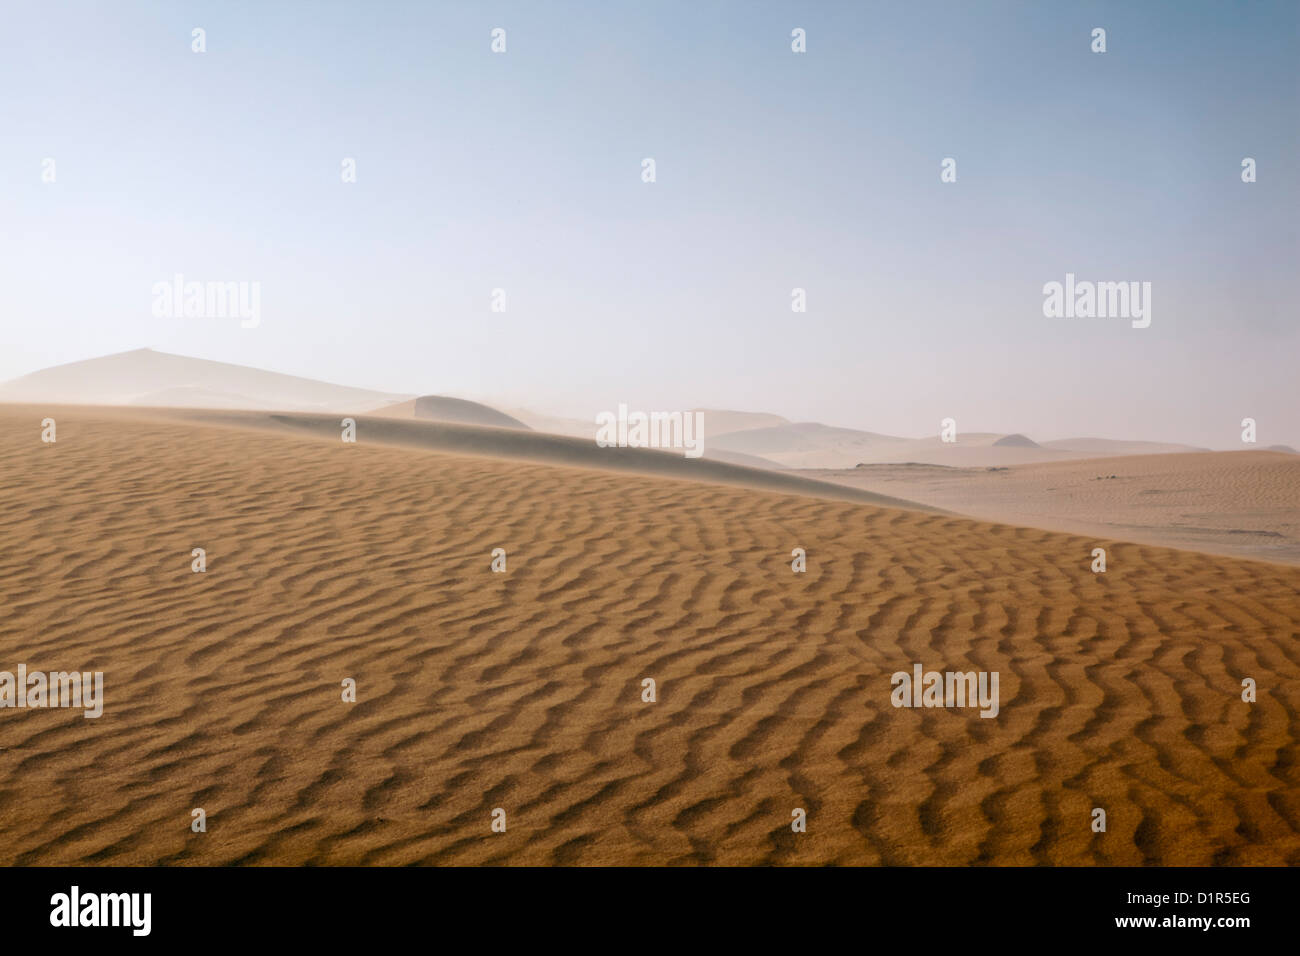 Morocco, M'Hamid, Erg Chigaga sand dunes. Sahara desert. Sand storm. - Stock Image